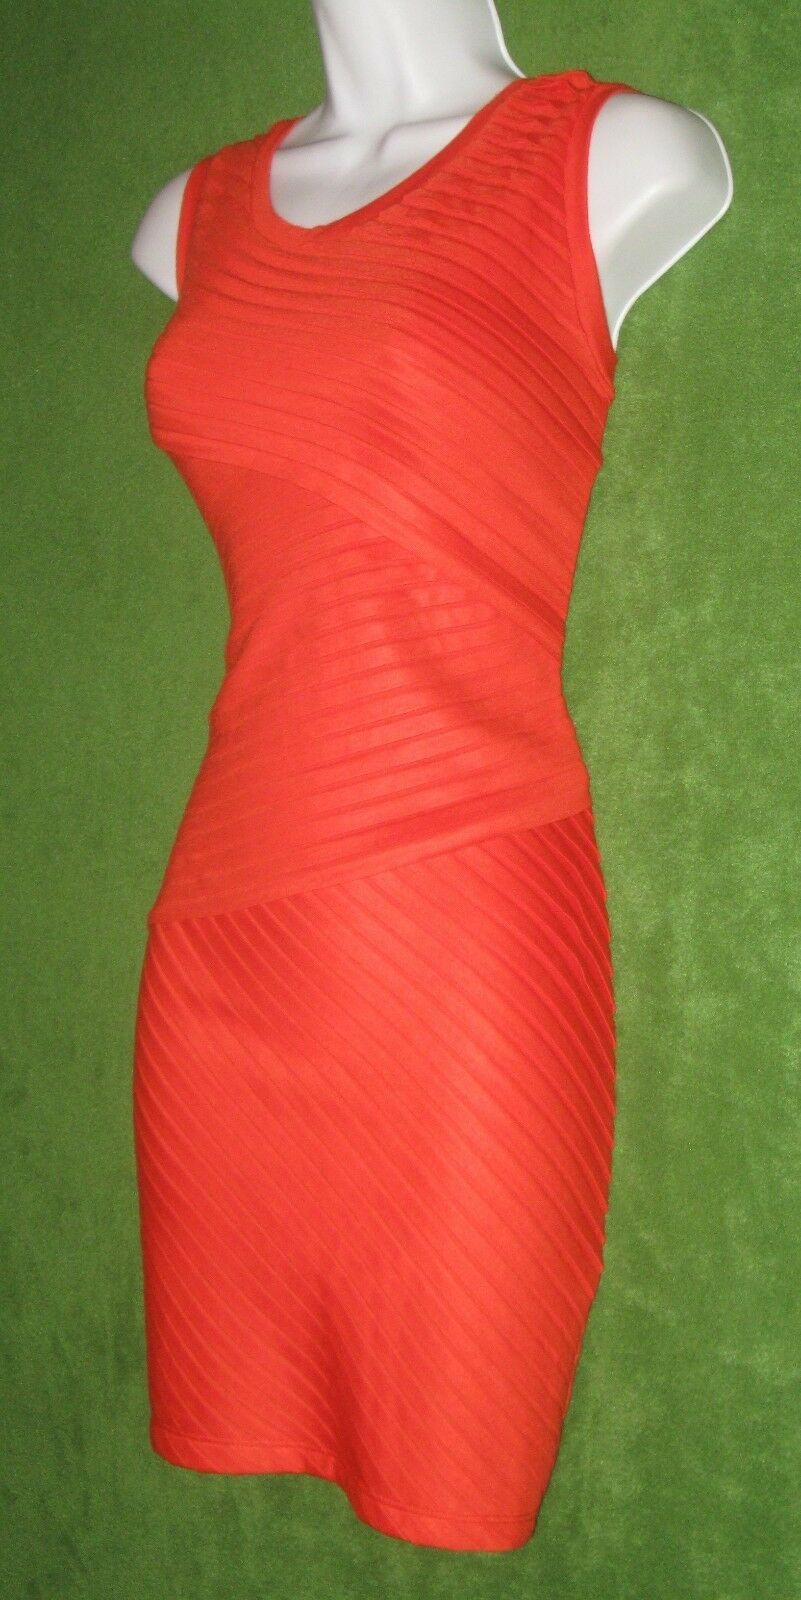 Kandy orange Shutter Pleat Stretch Casual Social Work Dress 10  MISC